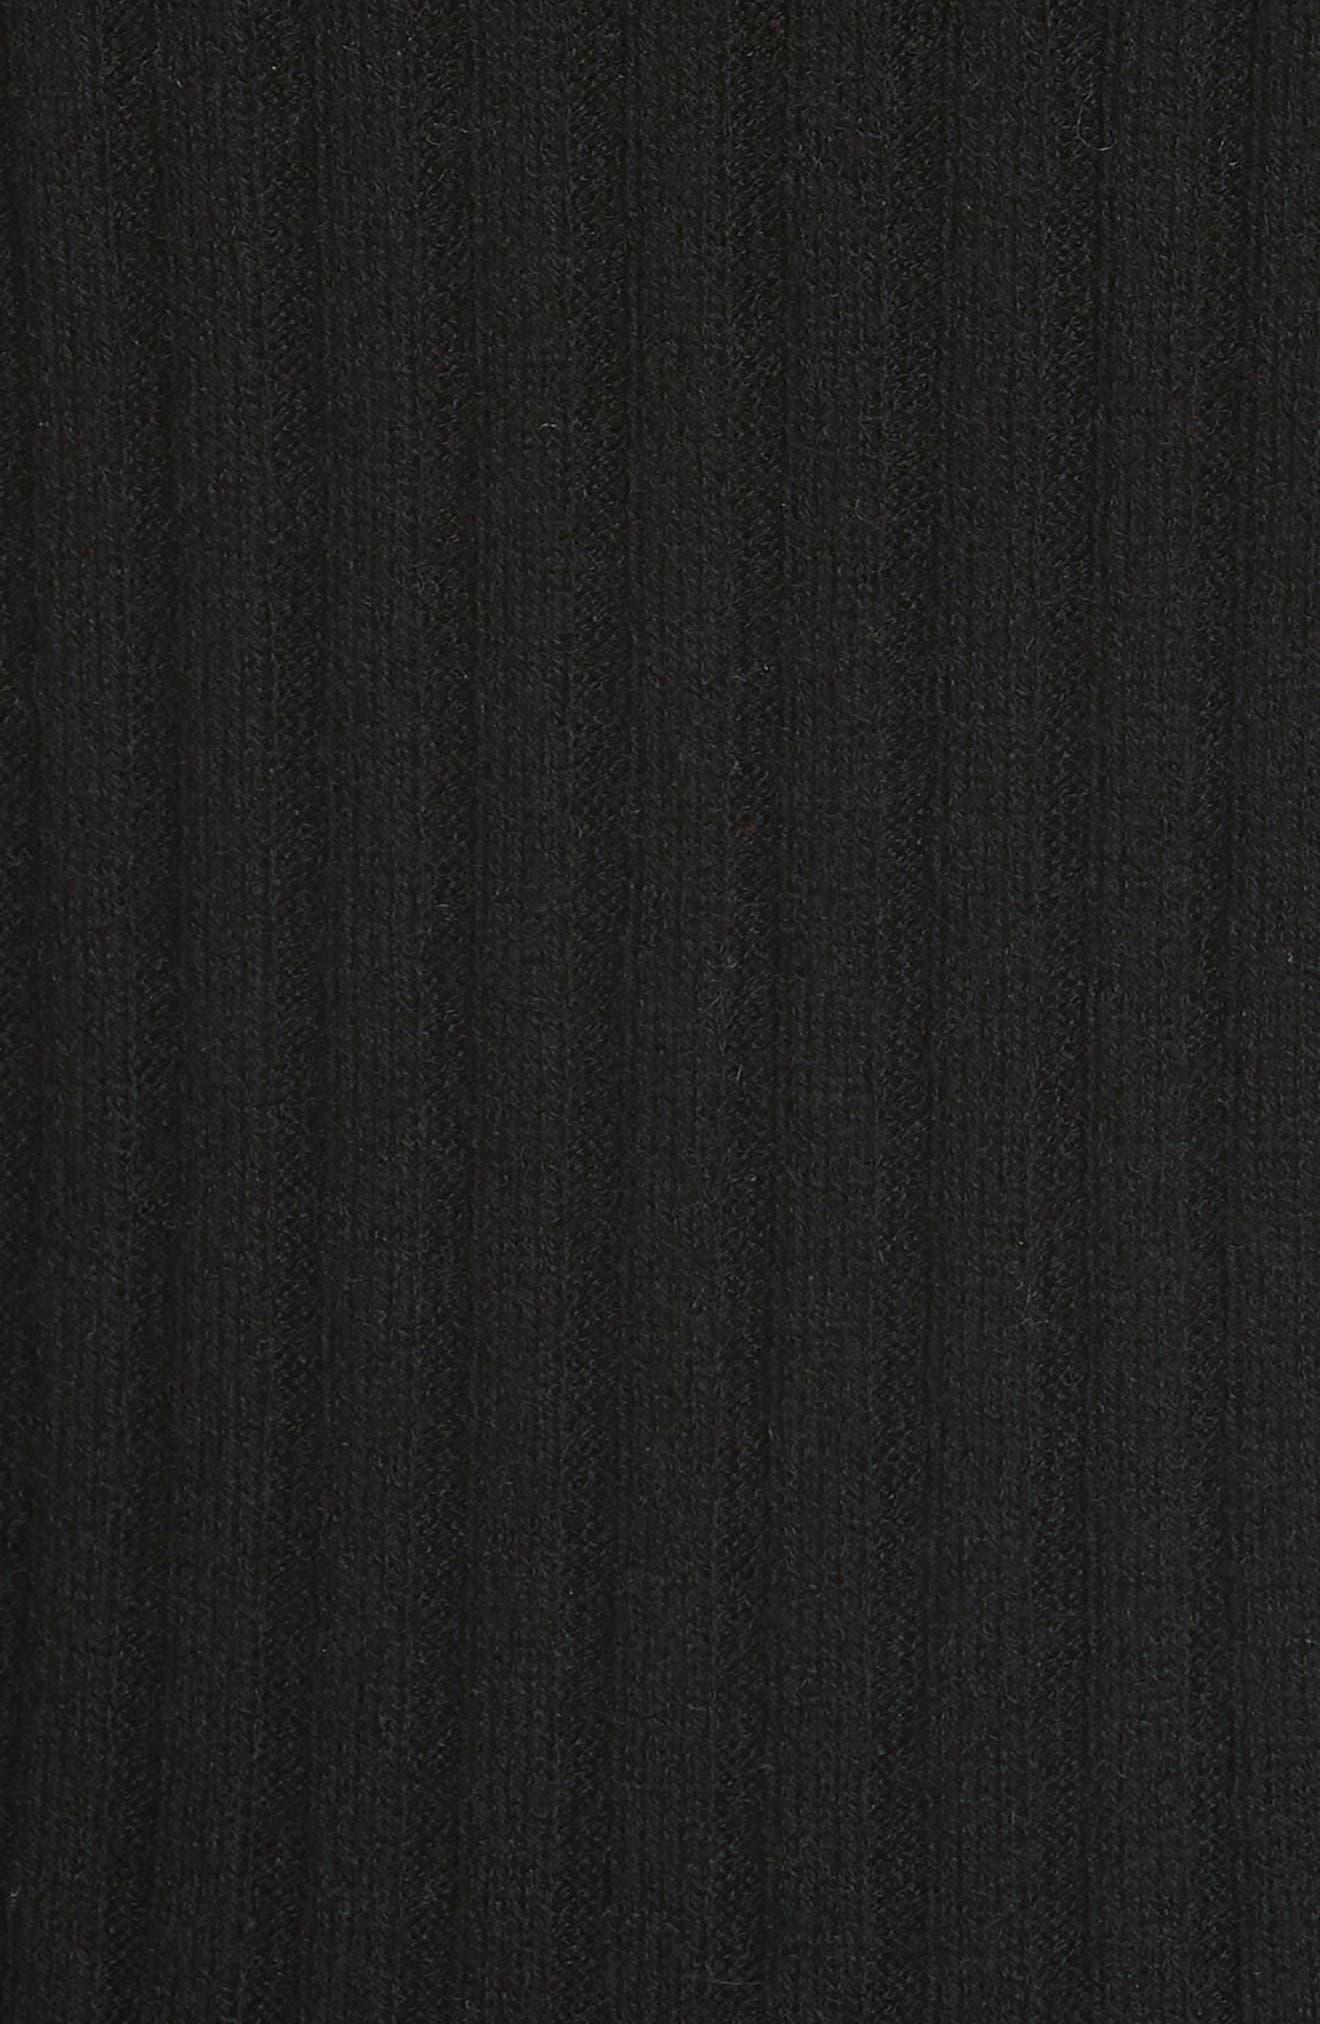 Ribbed Skinny Cashmere Cardigan,                             Alternate thumbnail 5, color,                             BLACK